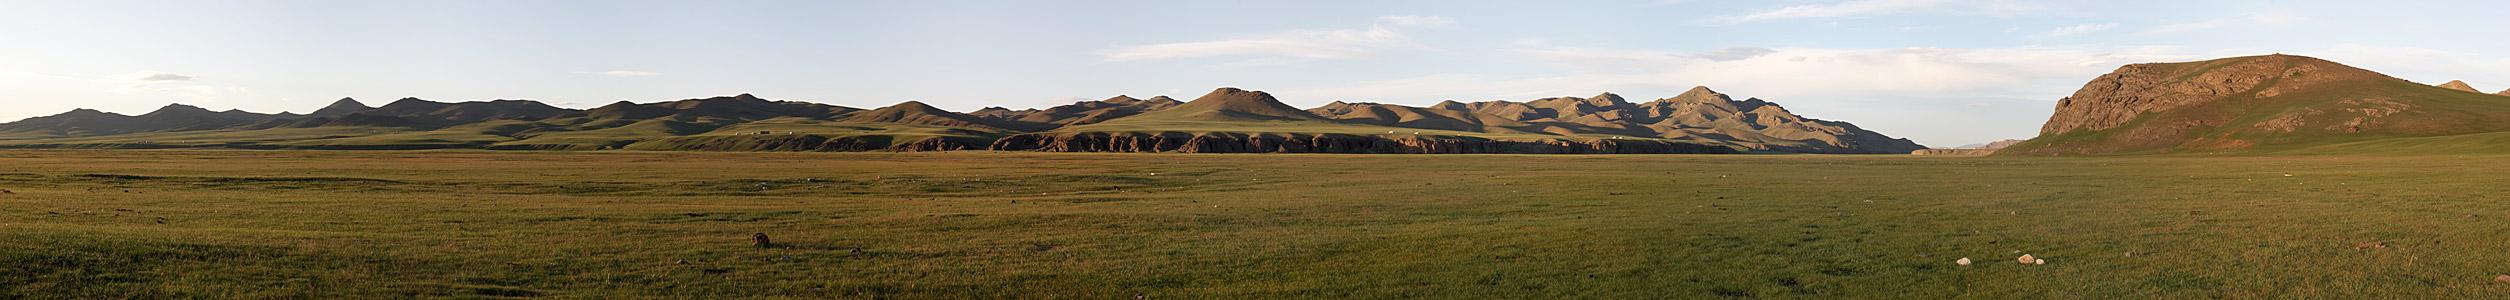 Panorama aus der mongolischen Steppe